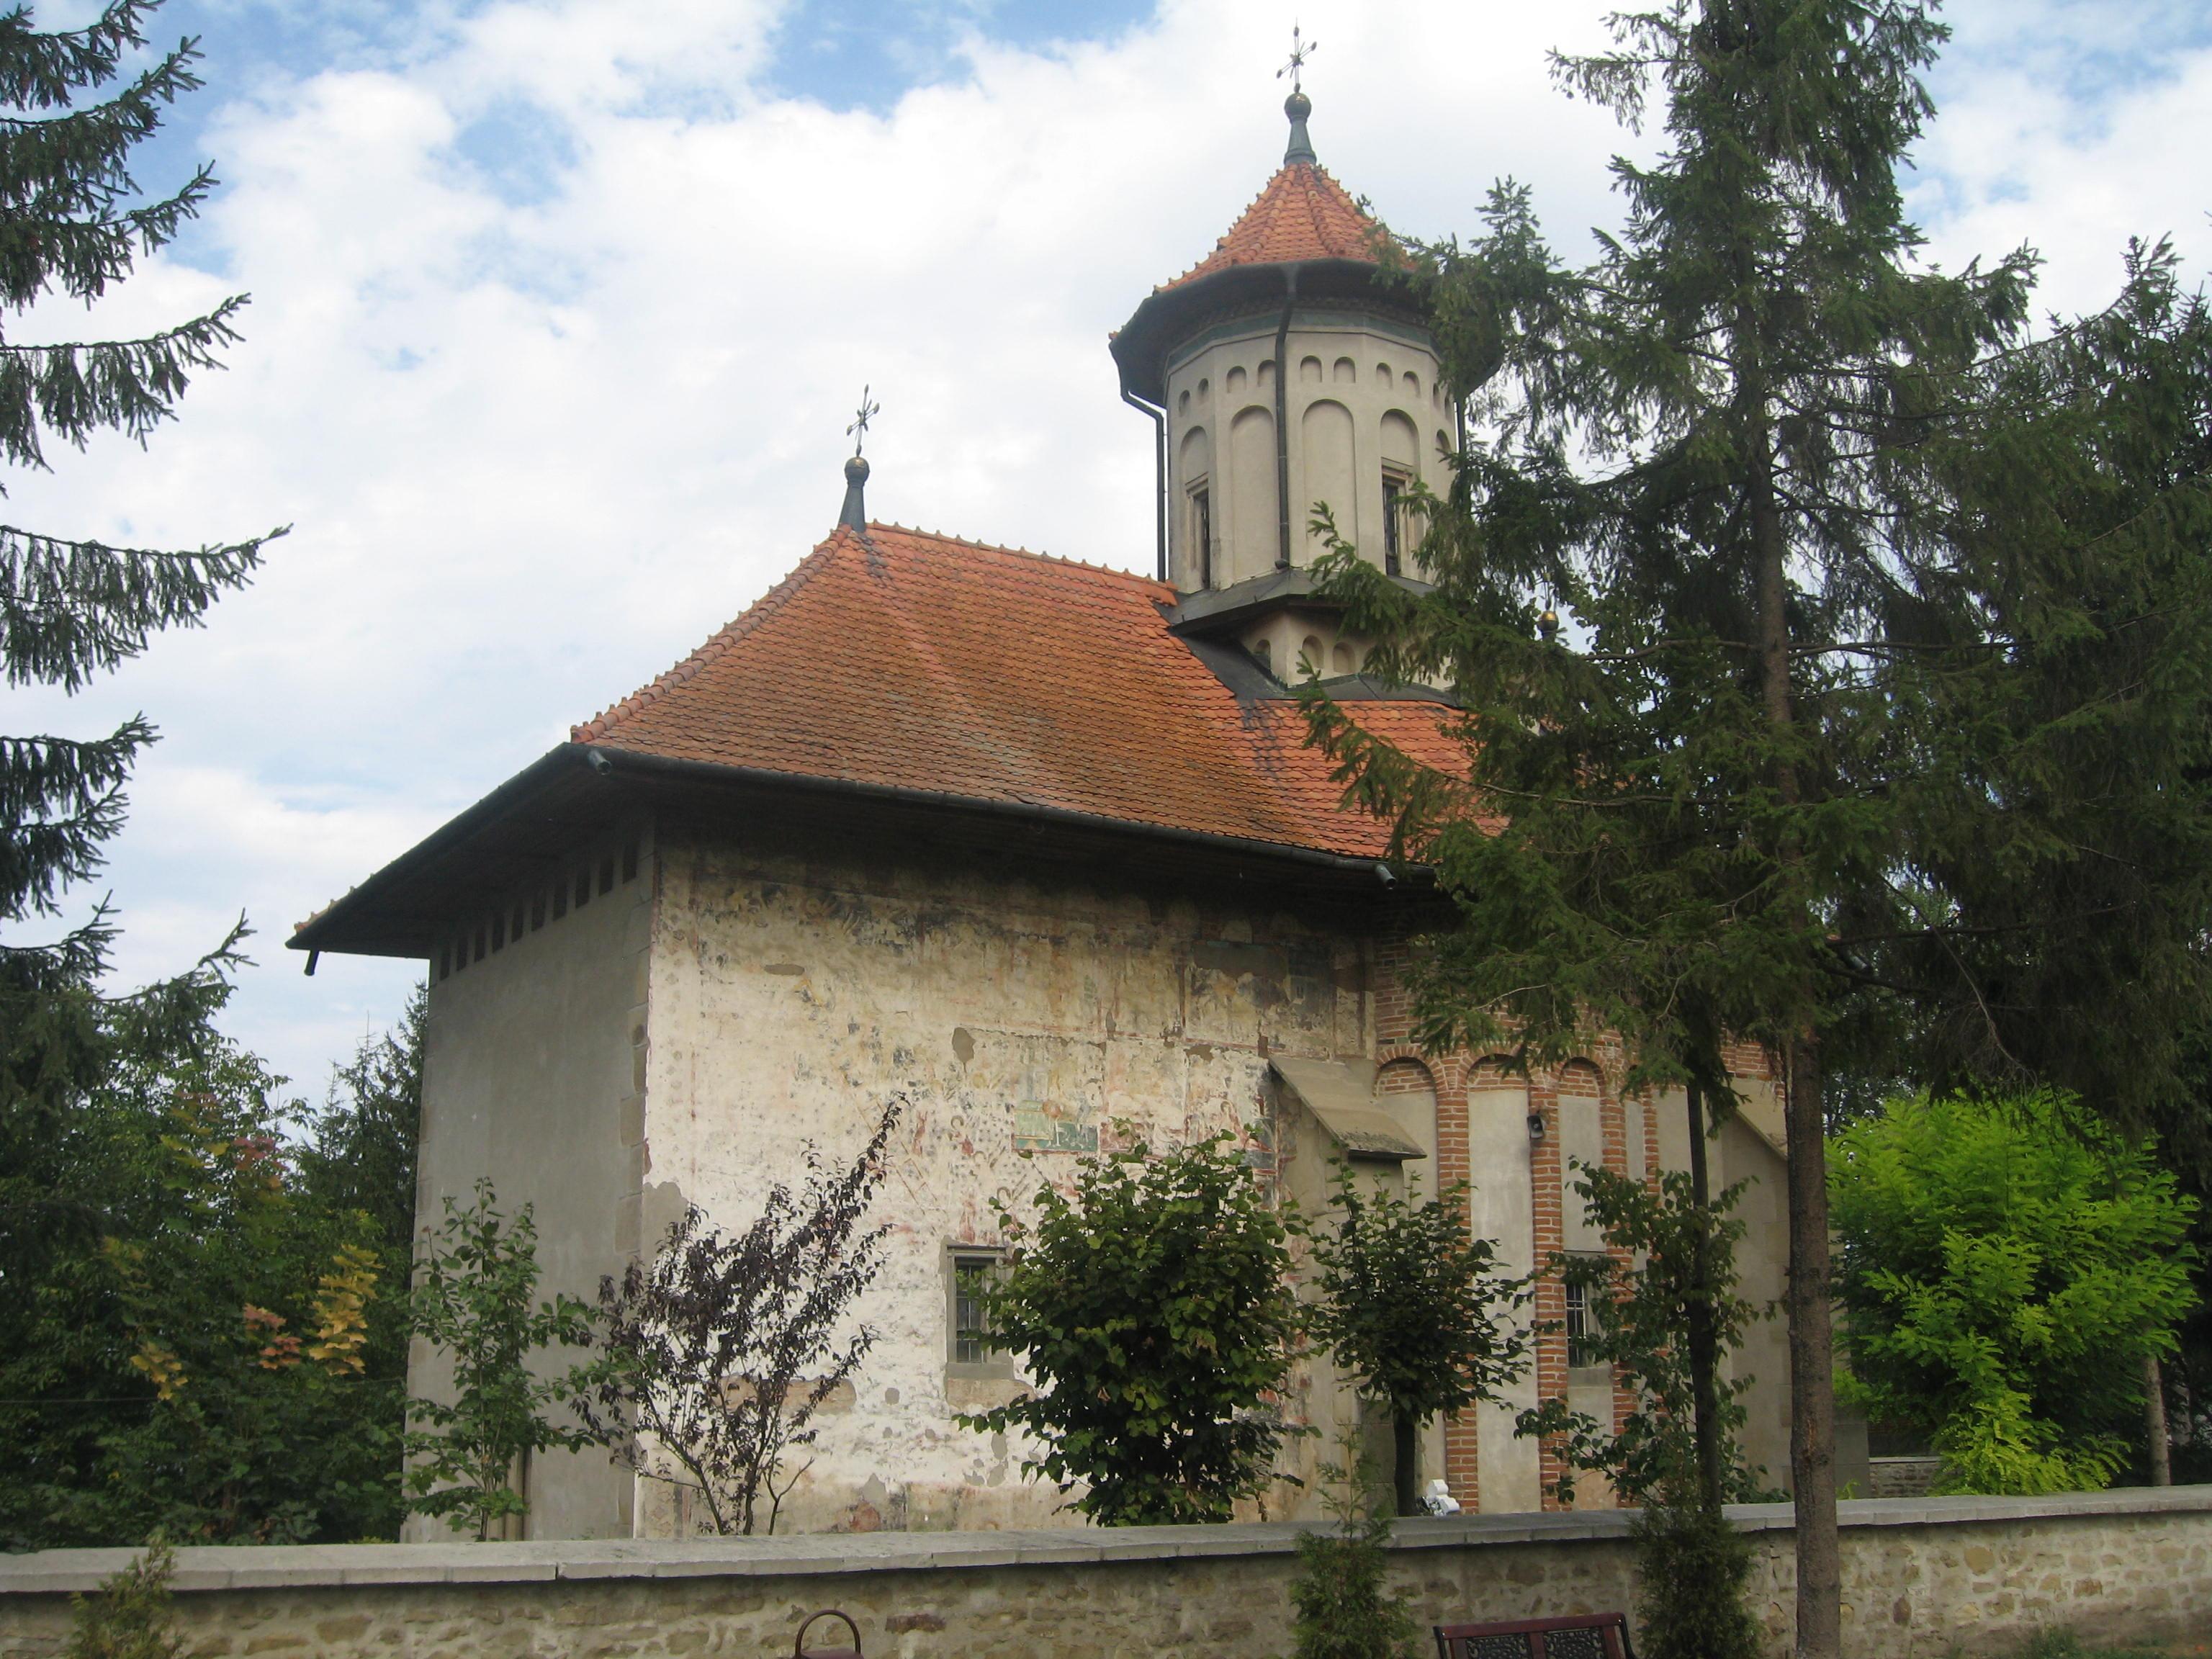 Biserica_Sfântul_Ilie_din_Sfântu_Ilie6